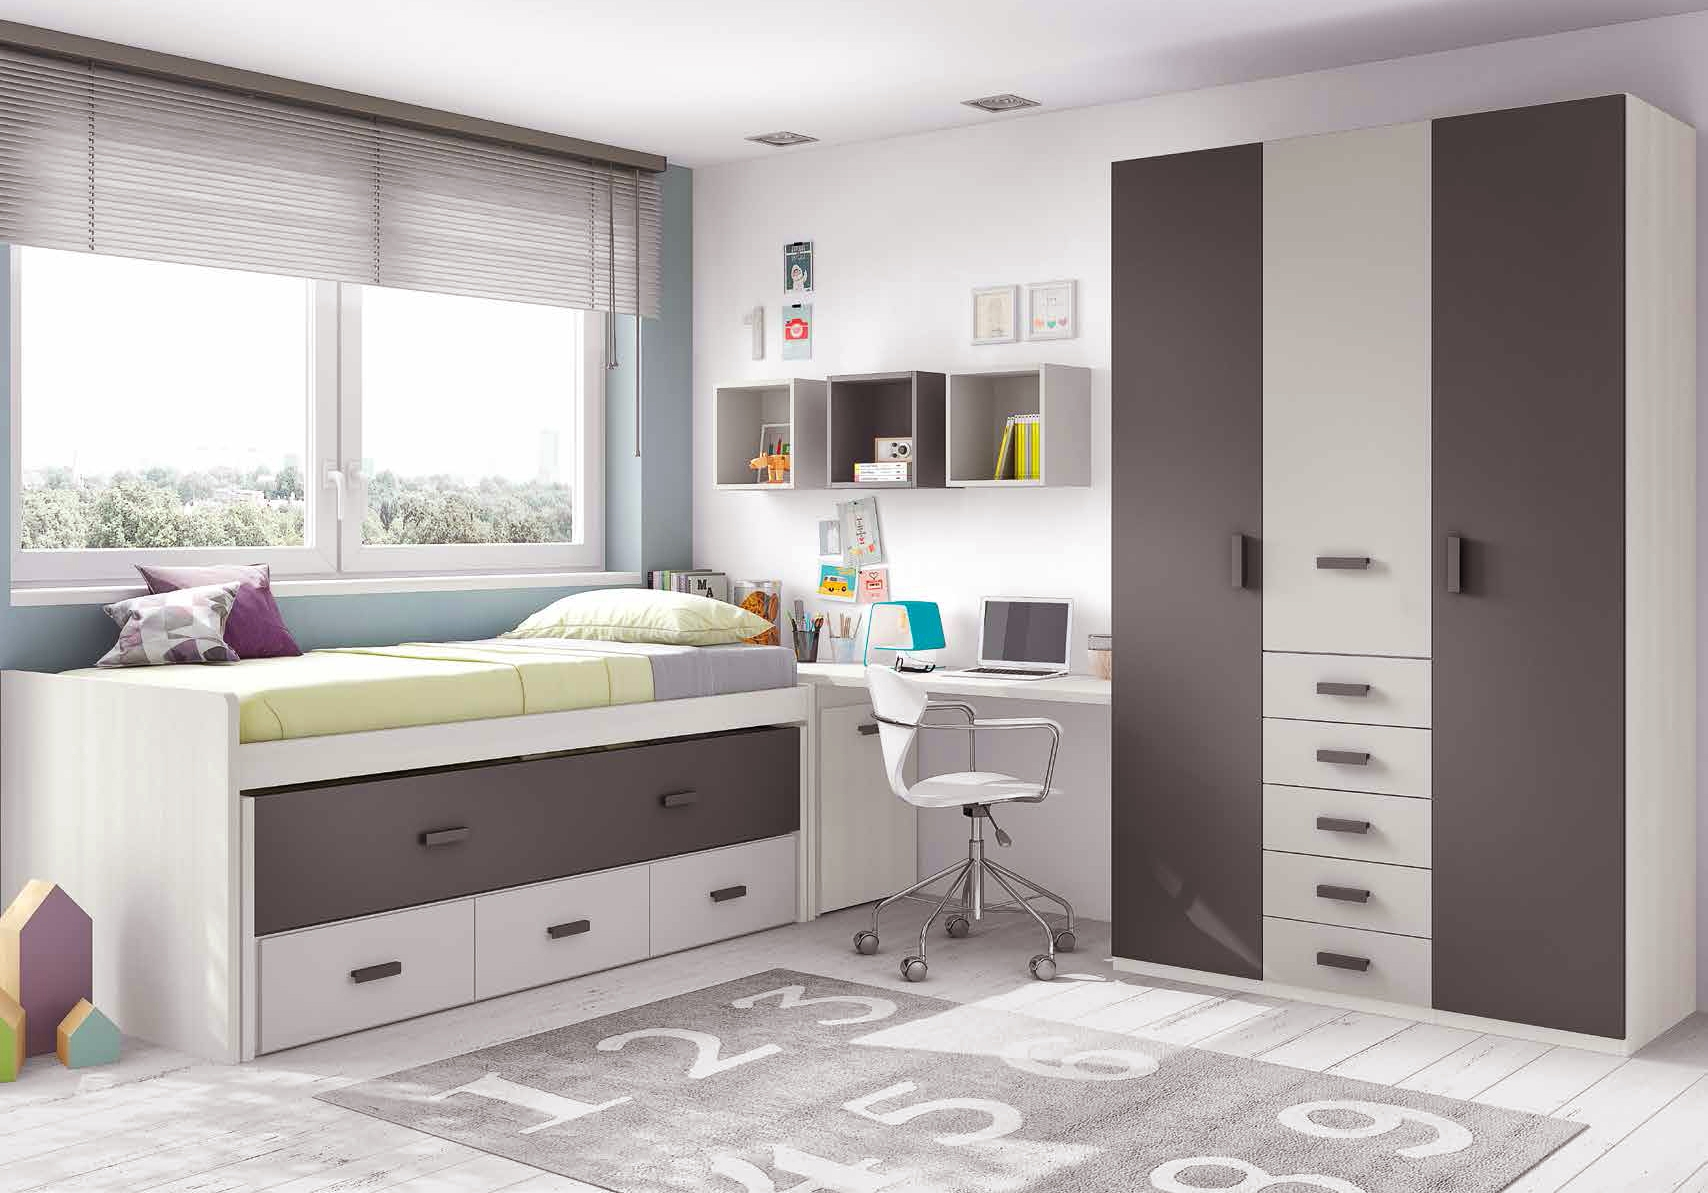 Chambre ado garcon moderne avec lit gigogne glicerio for Chambre pour ado garcon